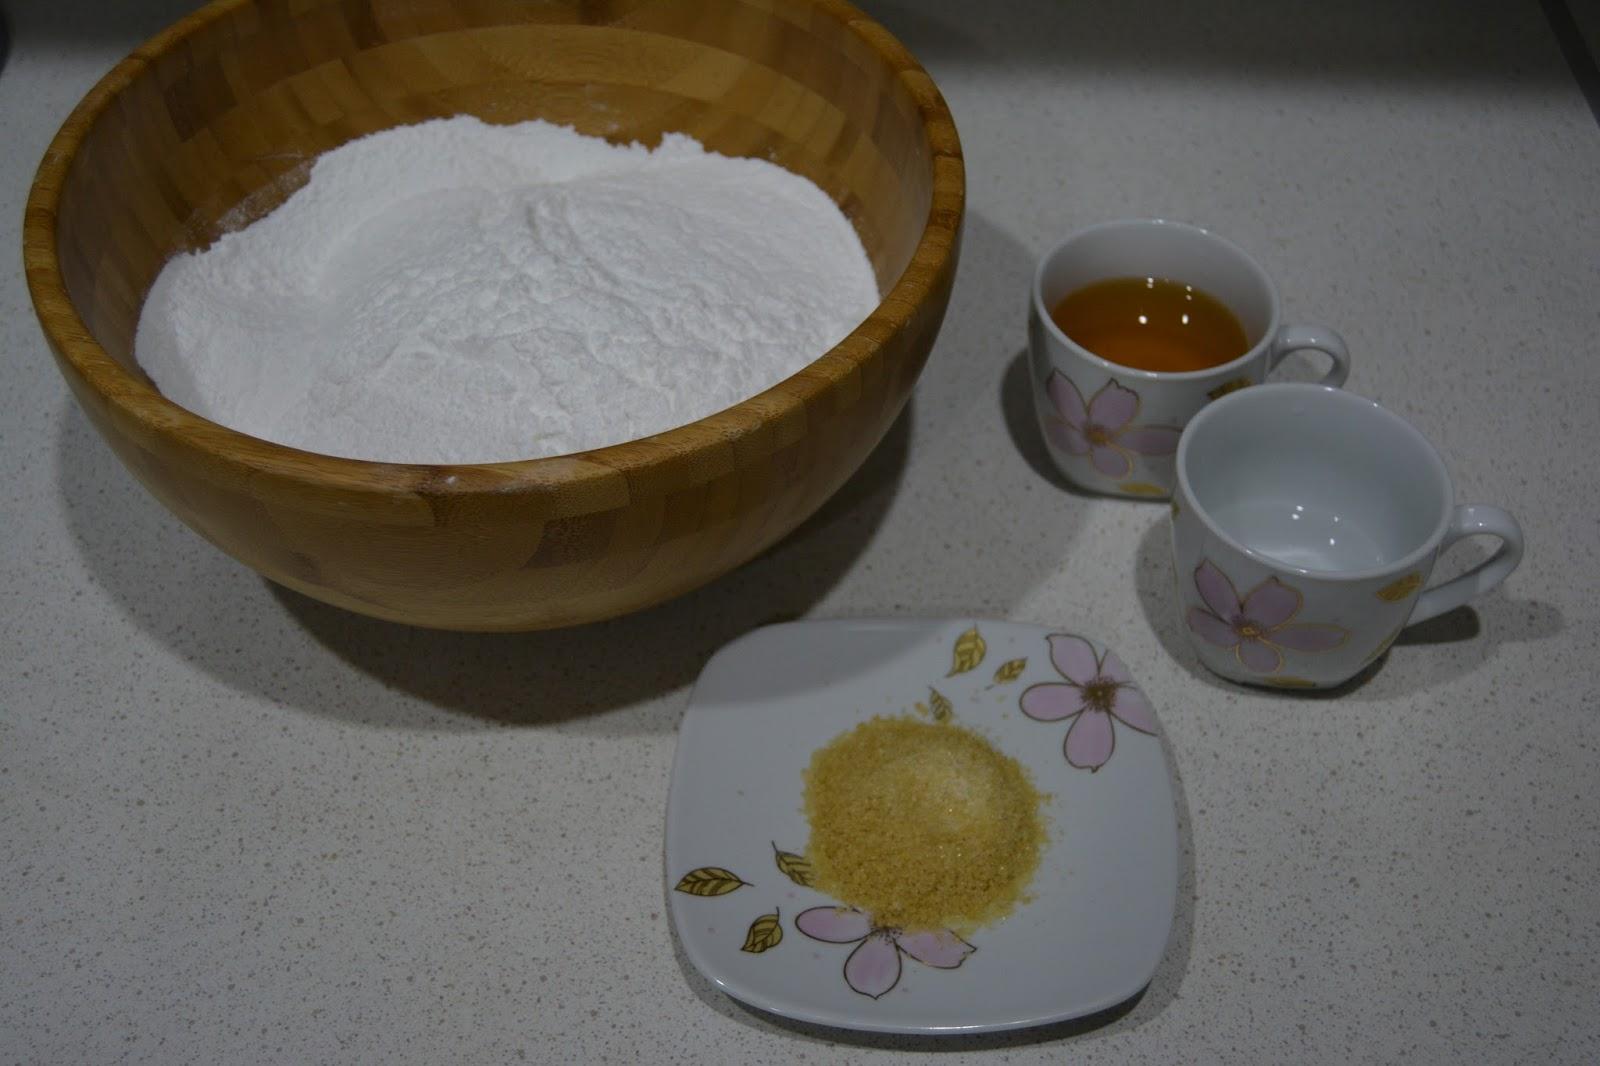 Мастика для торта в домашних условиях - рецепты с фото